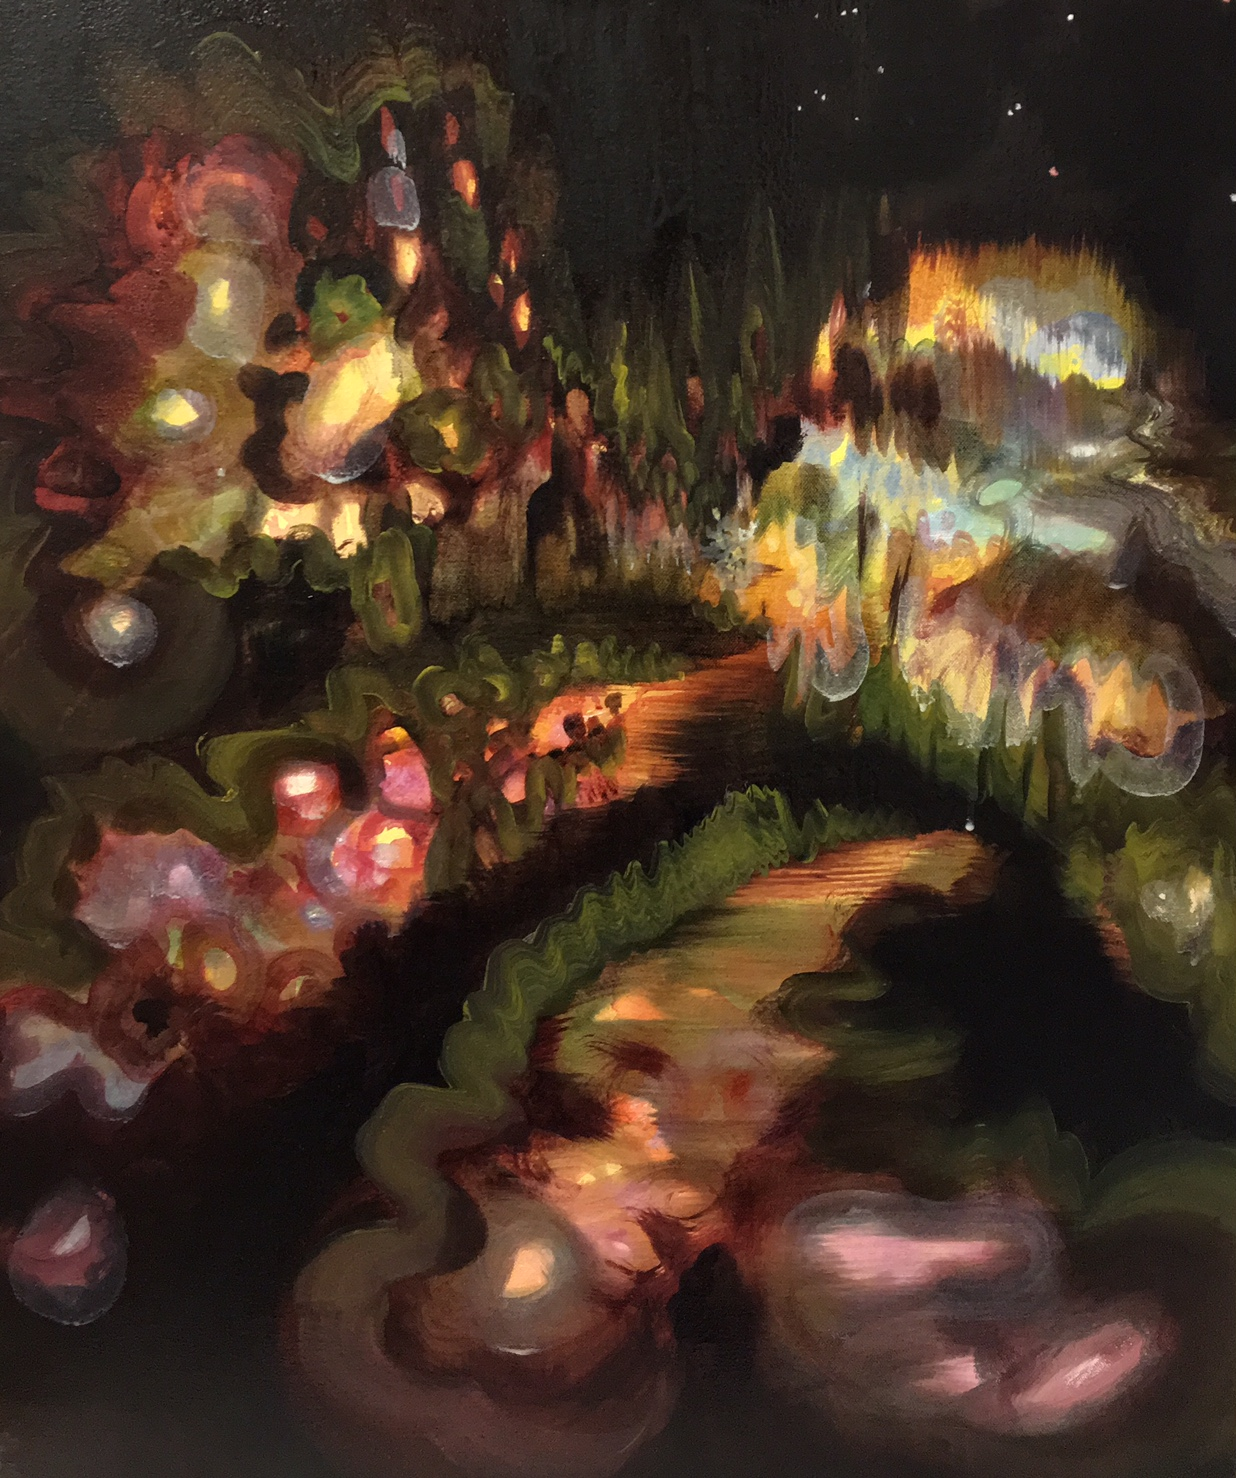 Work 2, New Brunswick Botanical Garden, oil on canvas, 2017.jpg